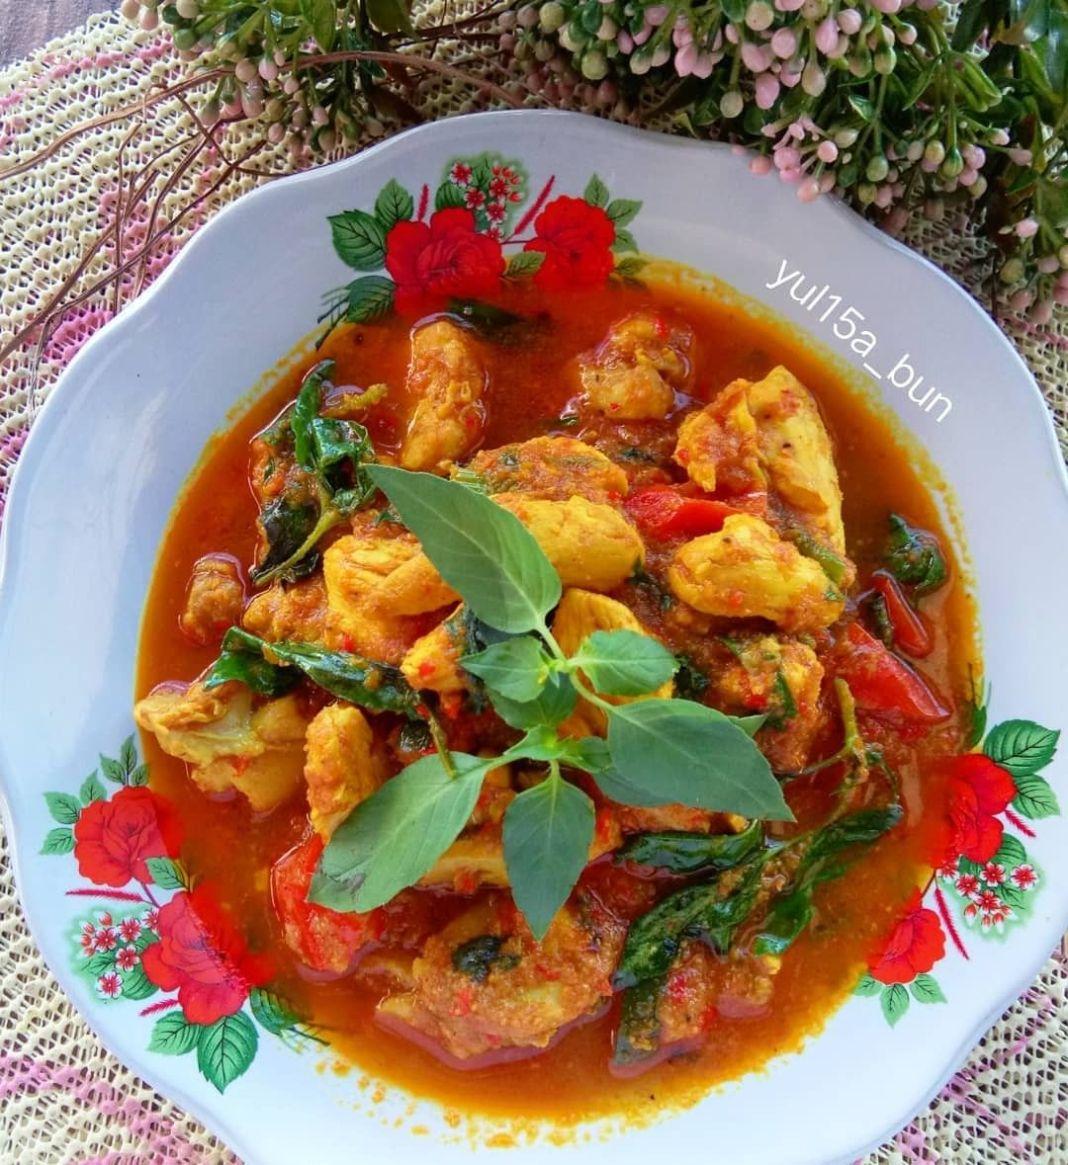 Info kuliner, Ayam woku  300 grm daging ayam fillet,beri sedikit garam 2 buah tomat potong kecil 2 batang ser…